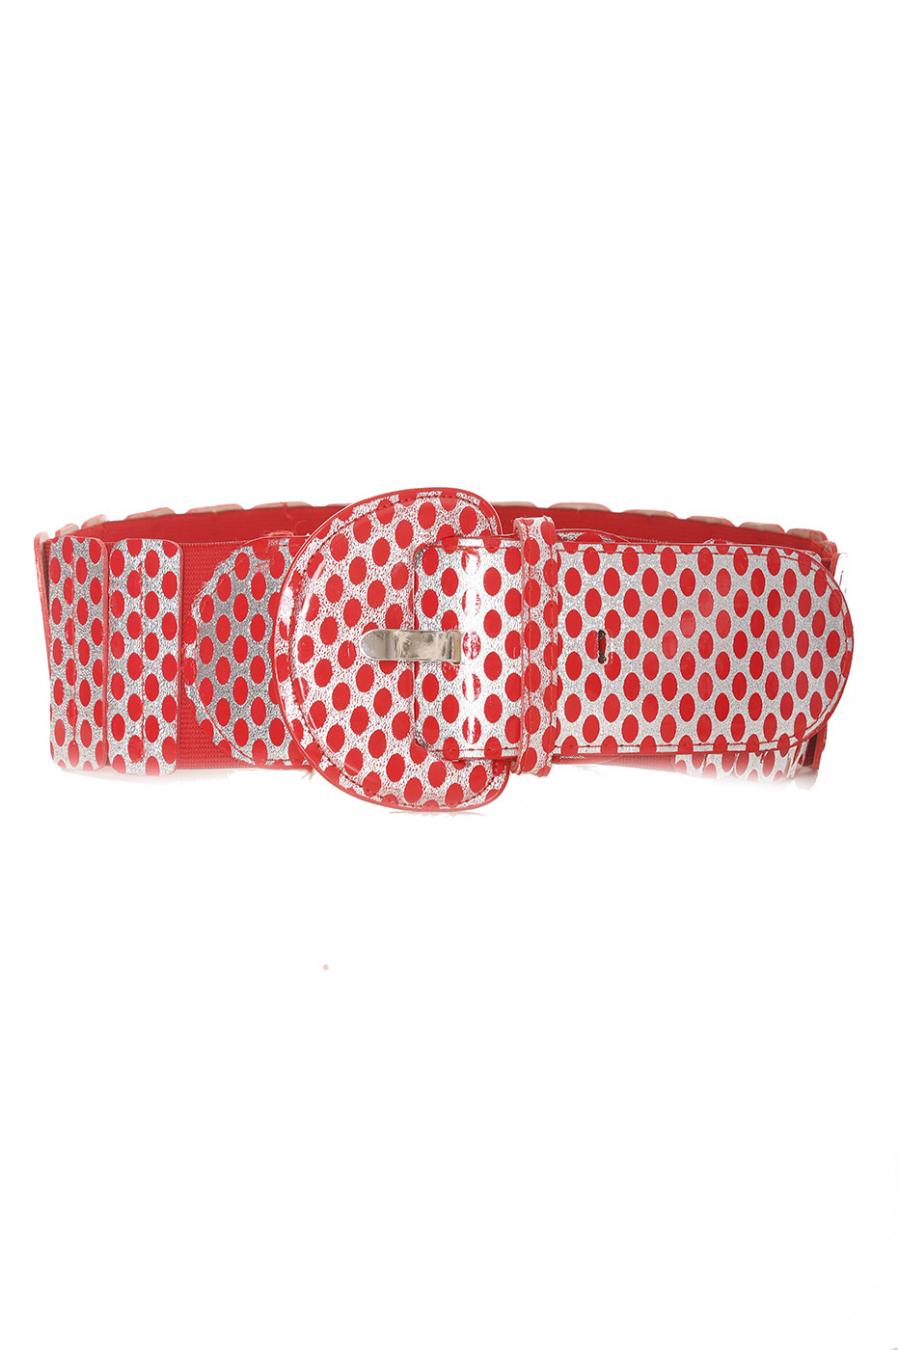 Rode elastische tailleband met print - BG - P045